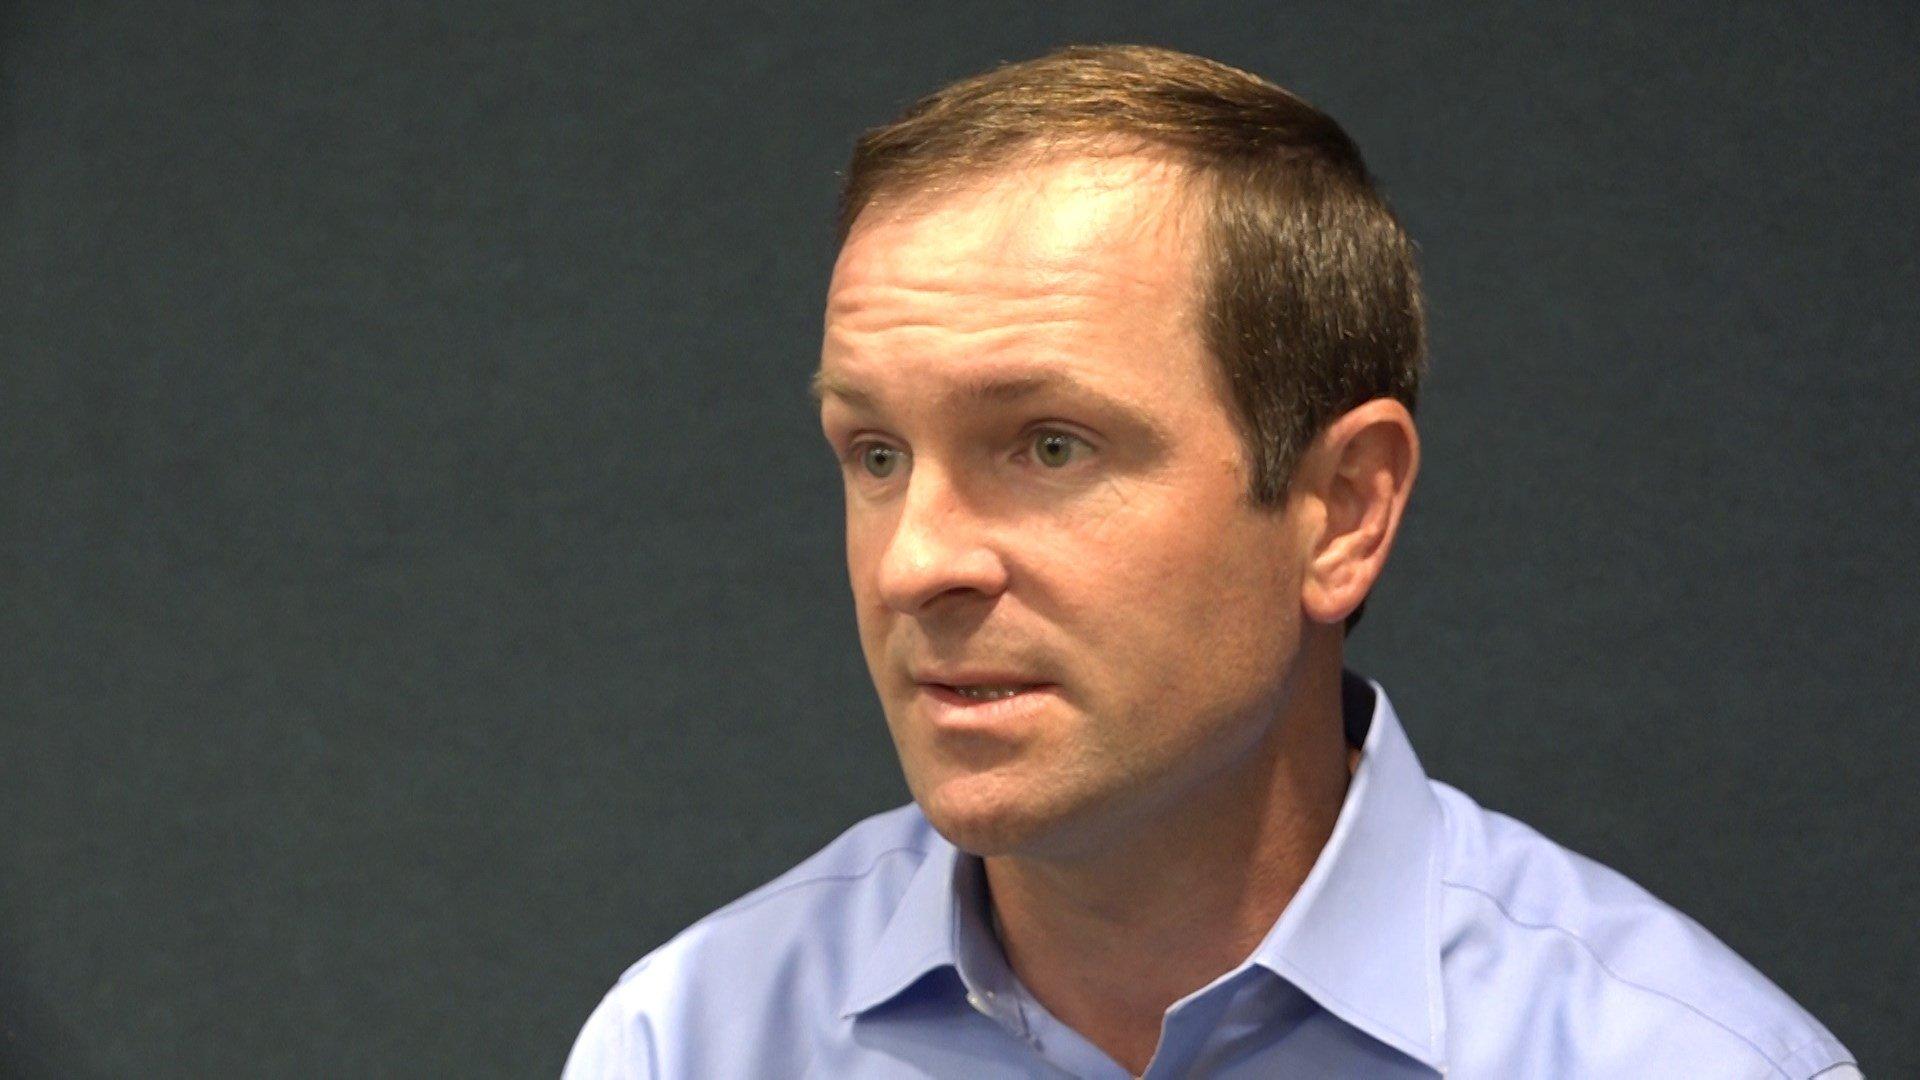 Blue Cross and Blue Shield of Montana spokesman John Doran